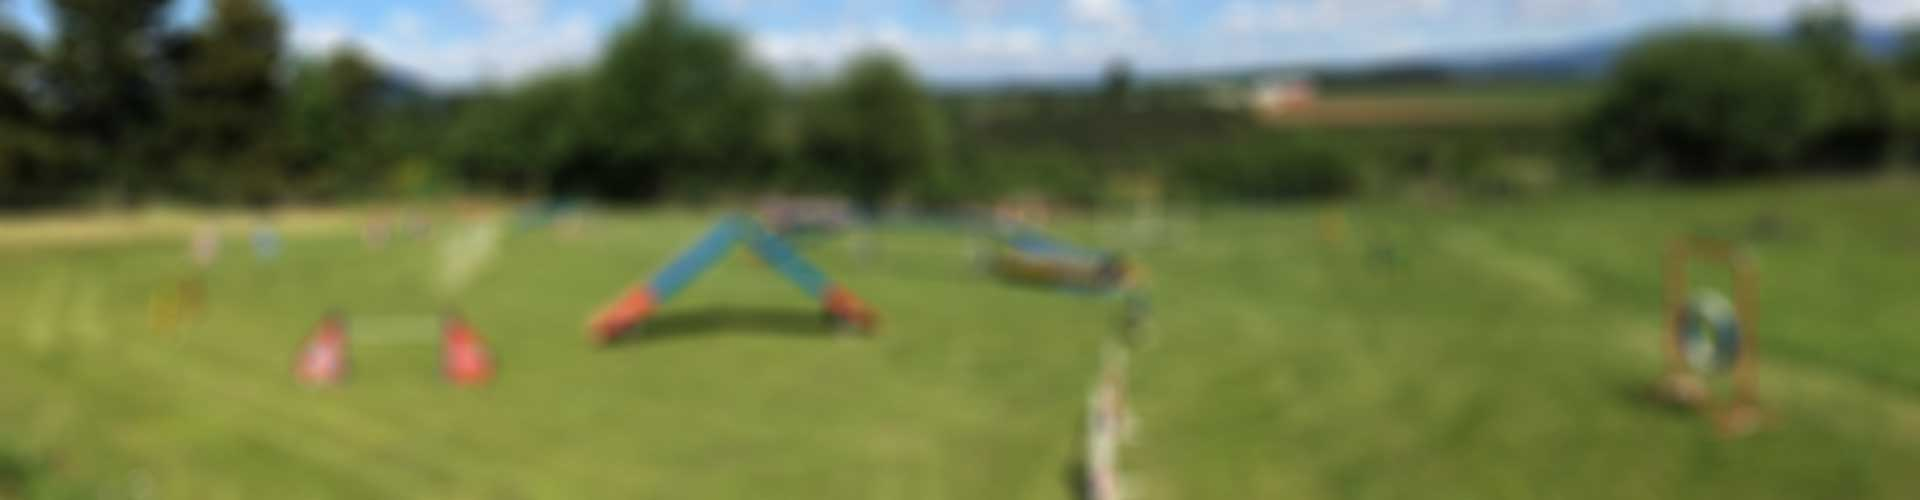 arenablur-bg-slide